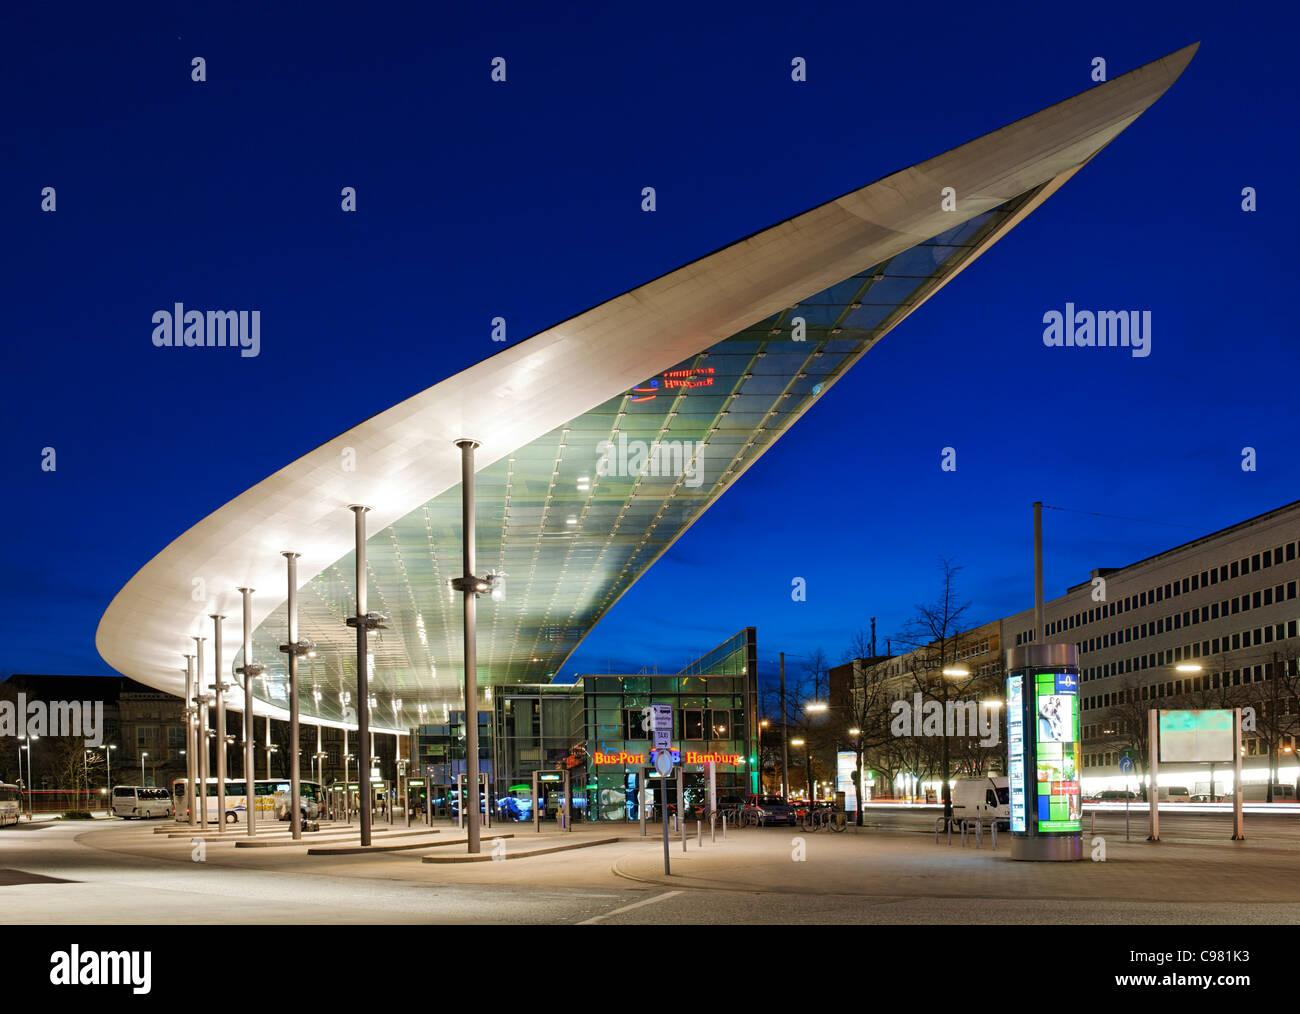 Modern Architecture Europe zob, central bus terminal, modern architecture, st. georg, hamburg